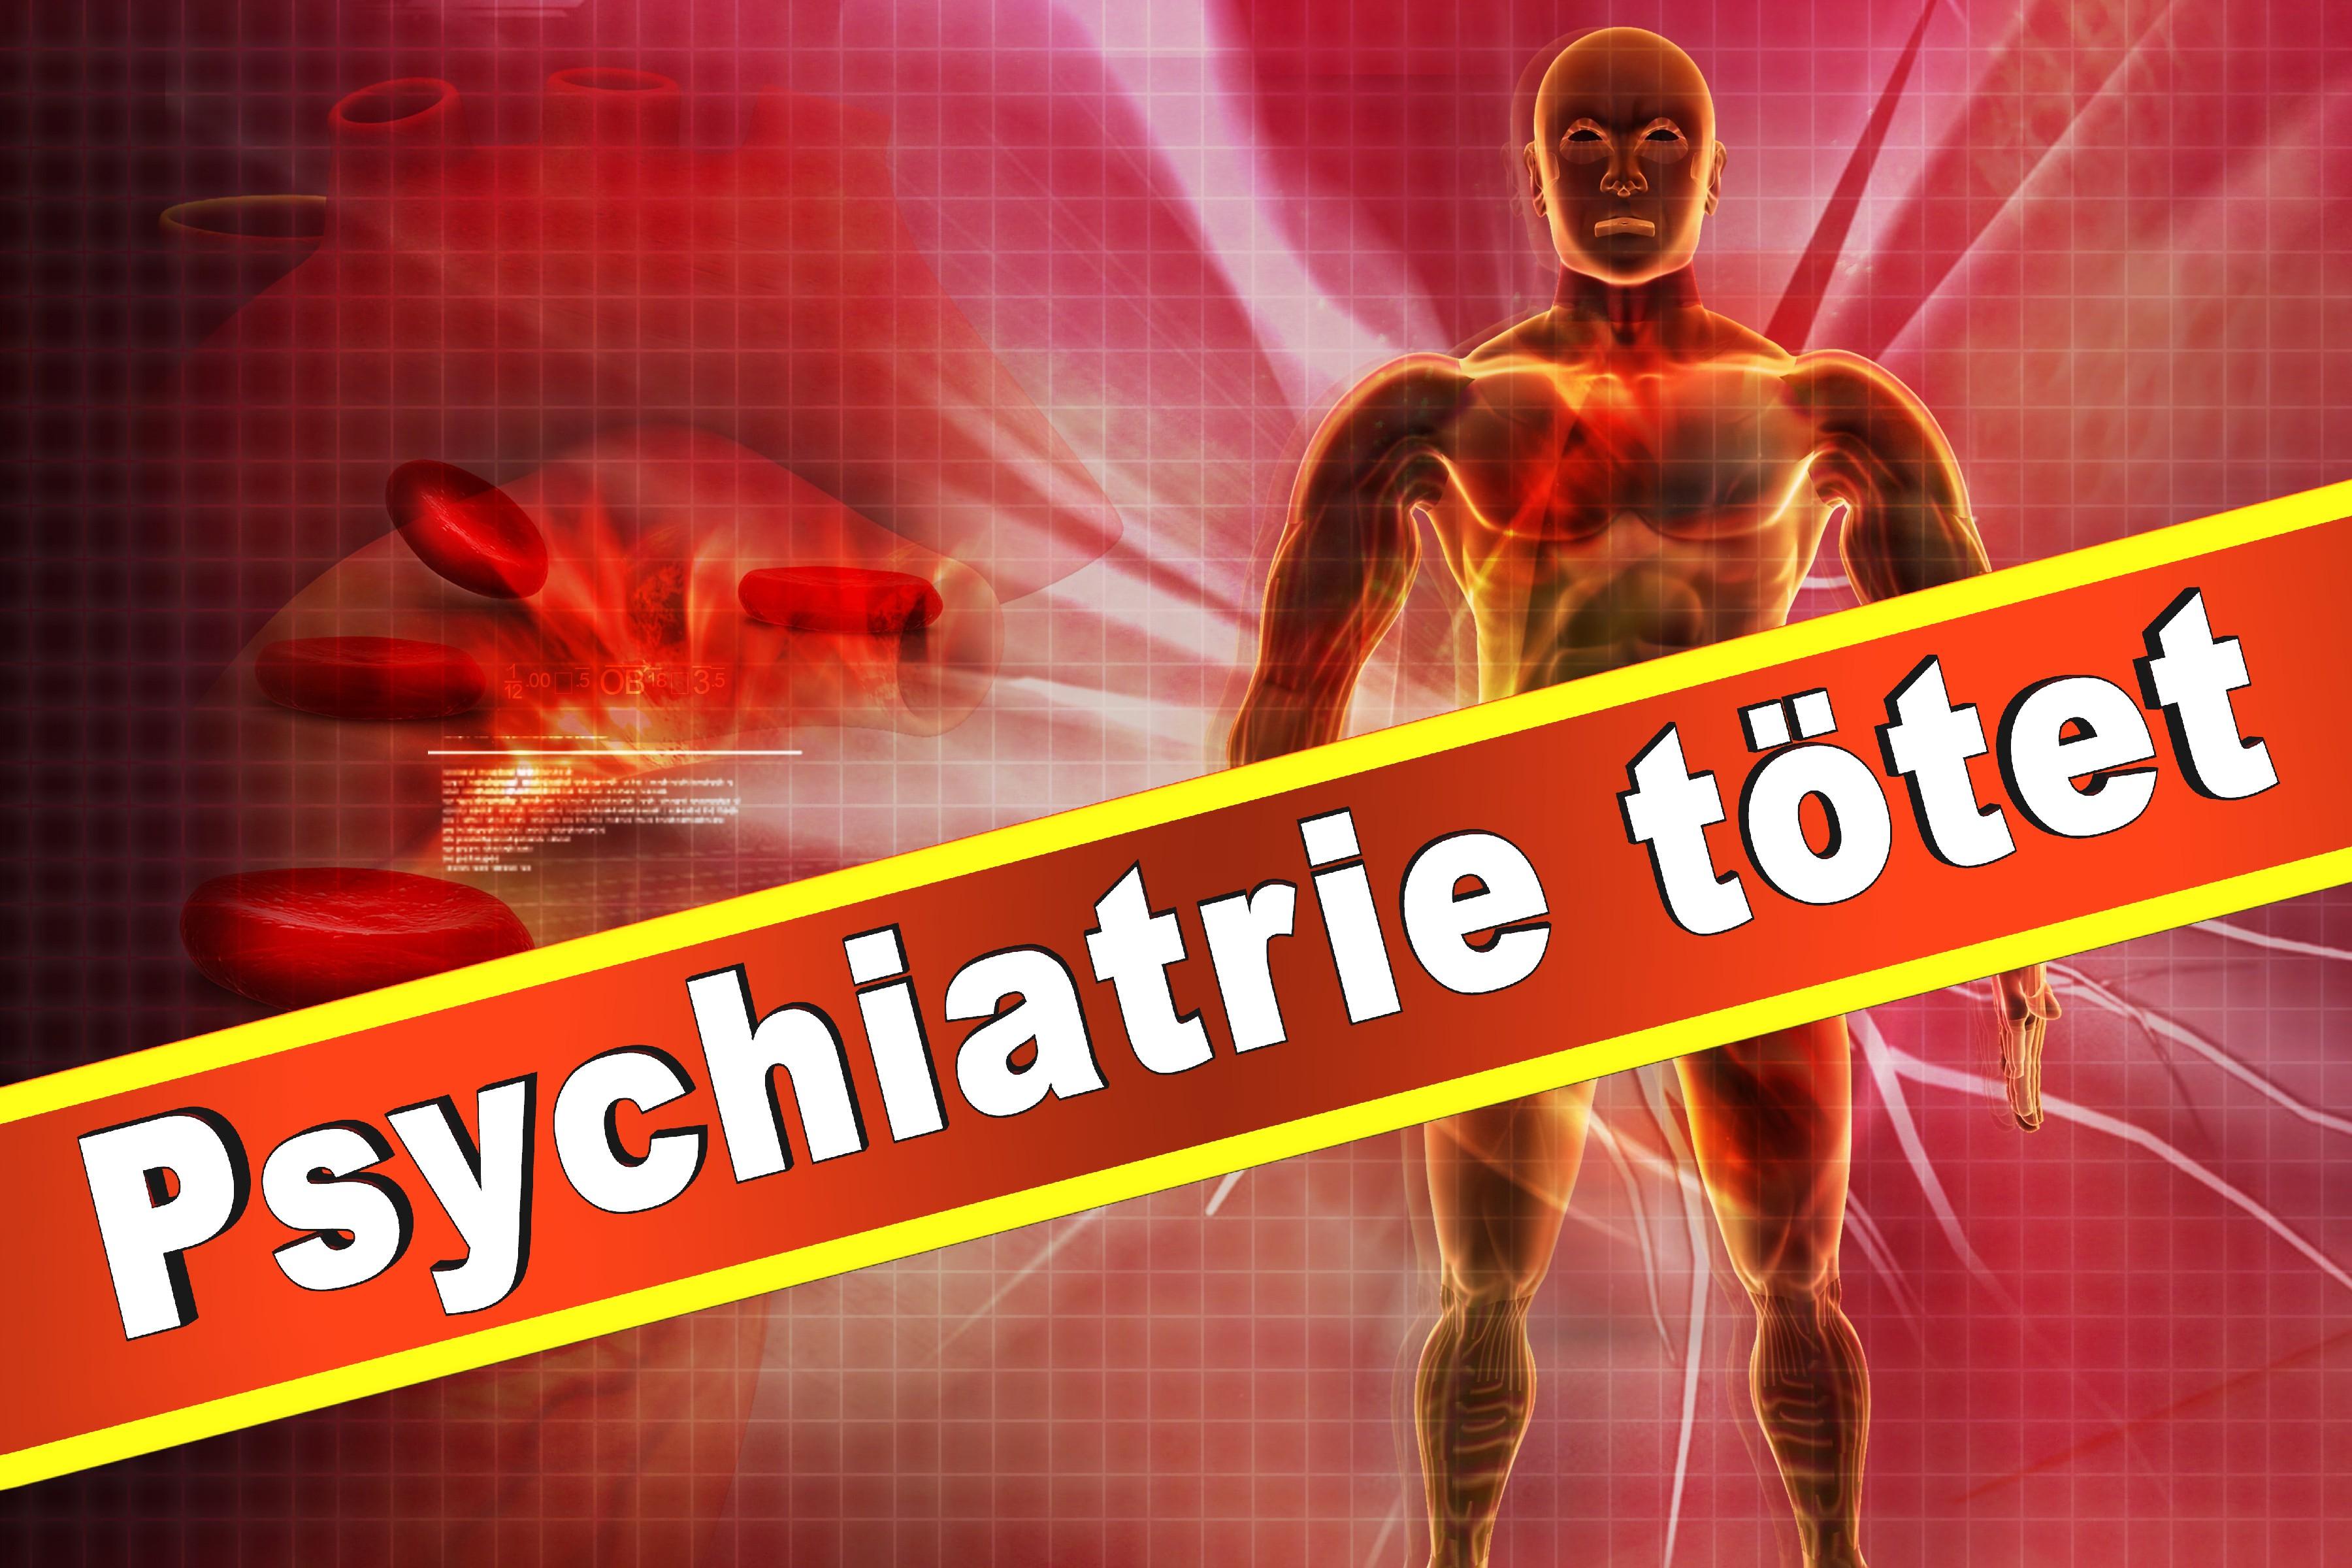 Uta Zimmermann Neurologe Hannover Gutachten Psychiater Facharzt Psychiatrie